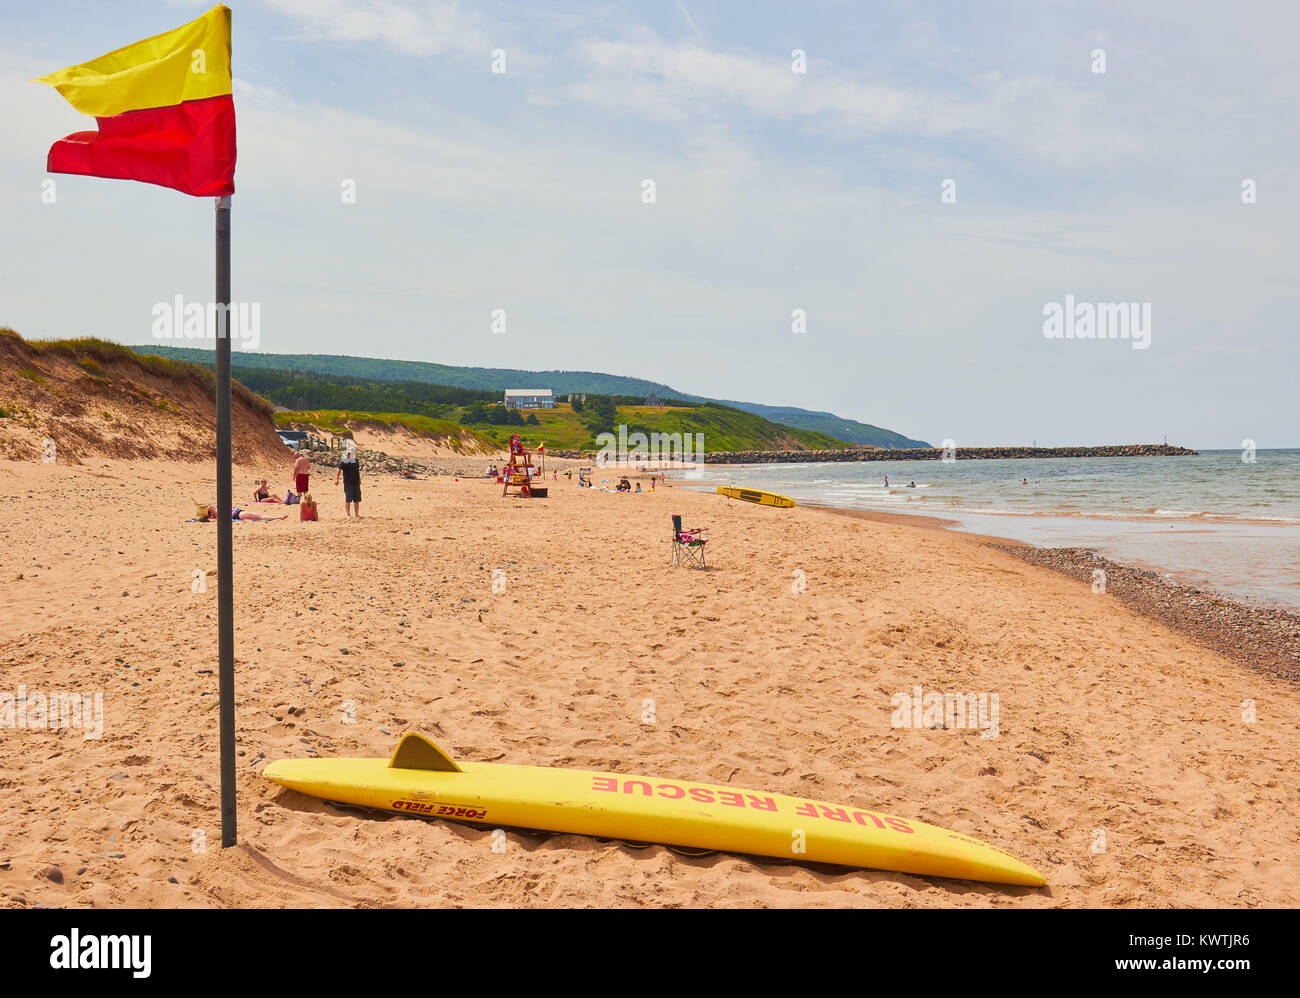 Surf rescue, Inverness beach, Inverness County, Cape Breton Island, Nova Scoatia, Canada. West coast of Cape Breton Stock Photo